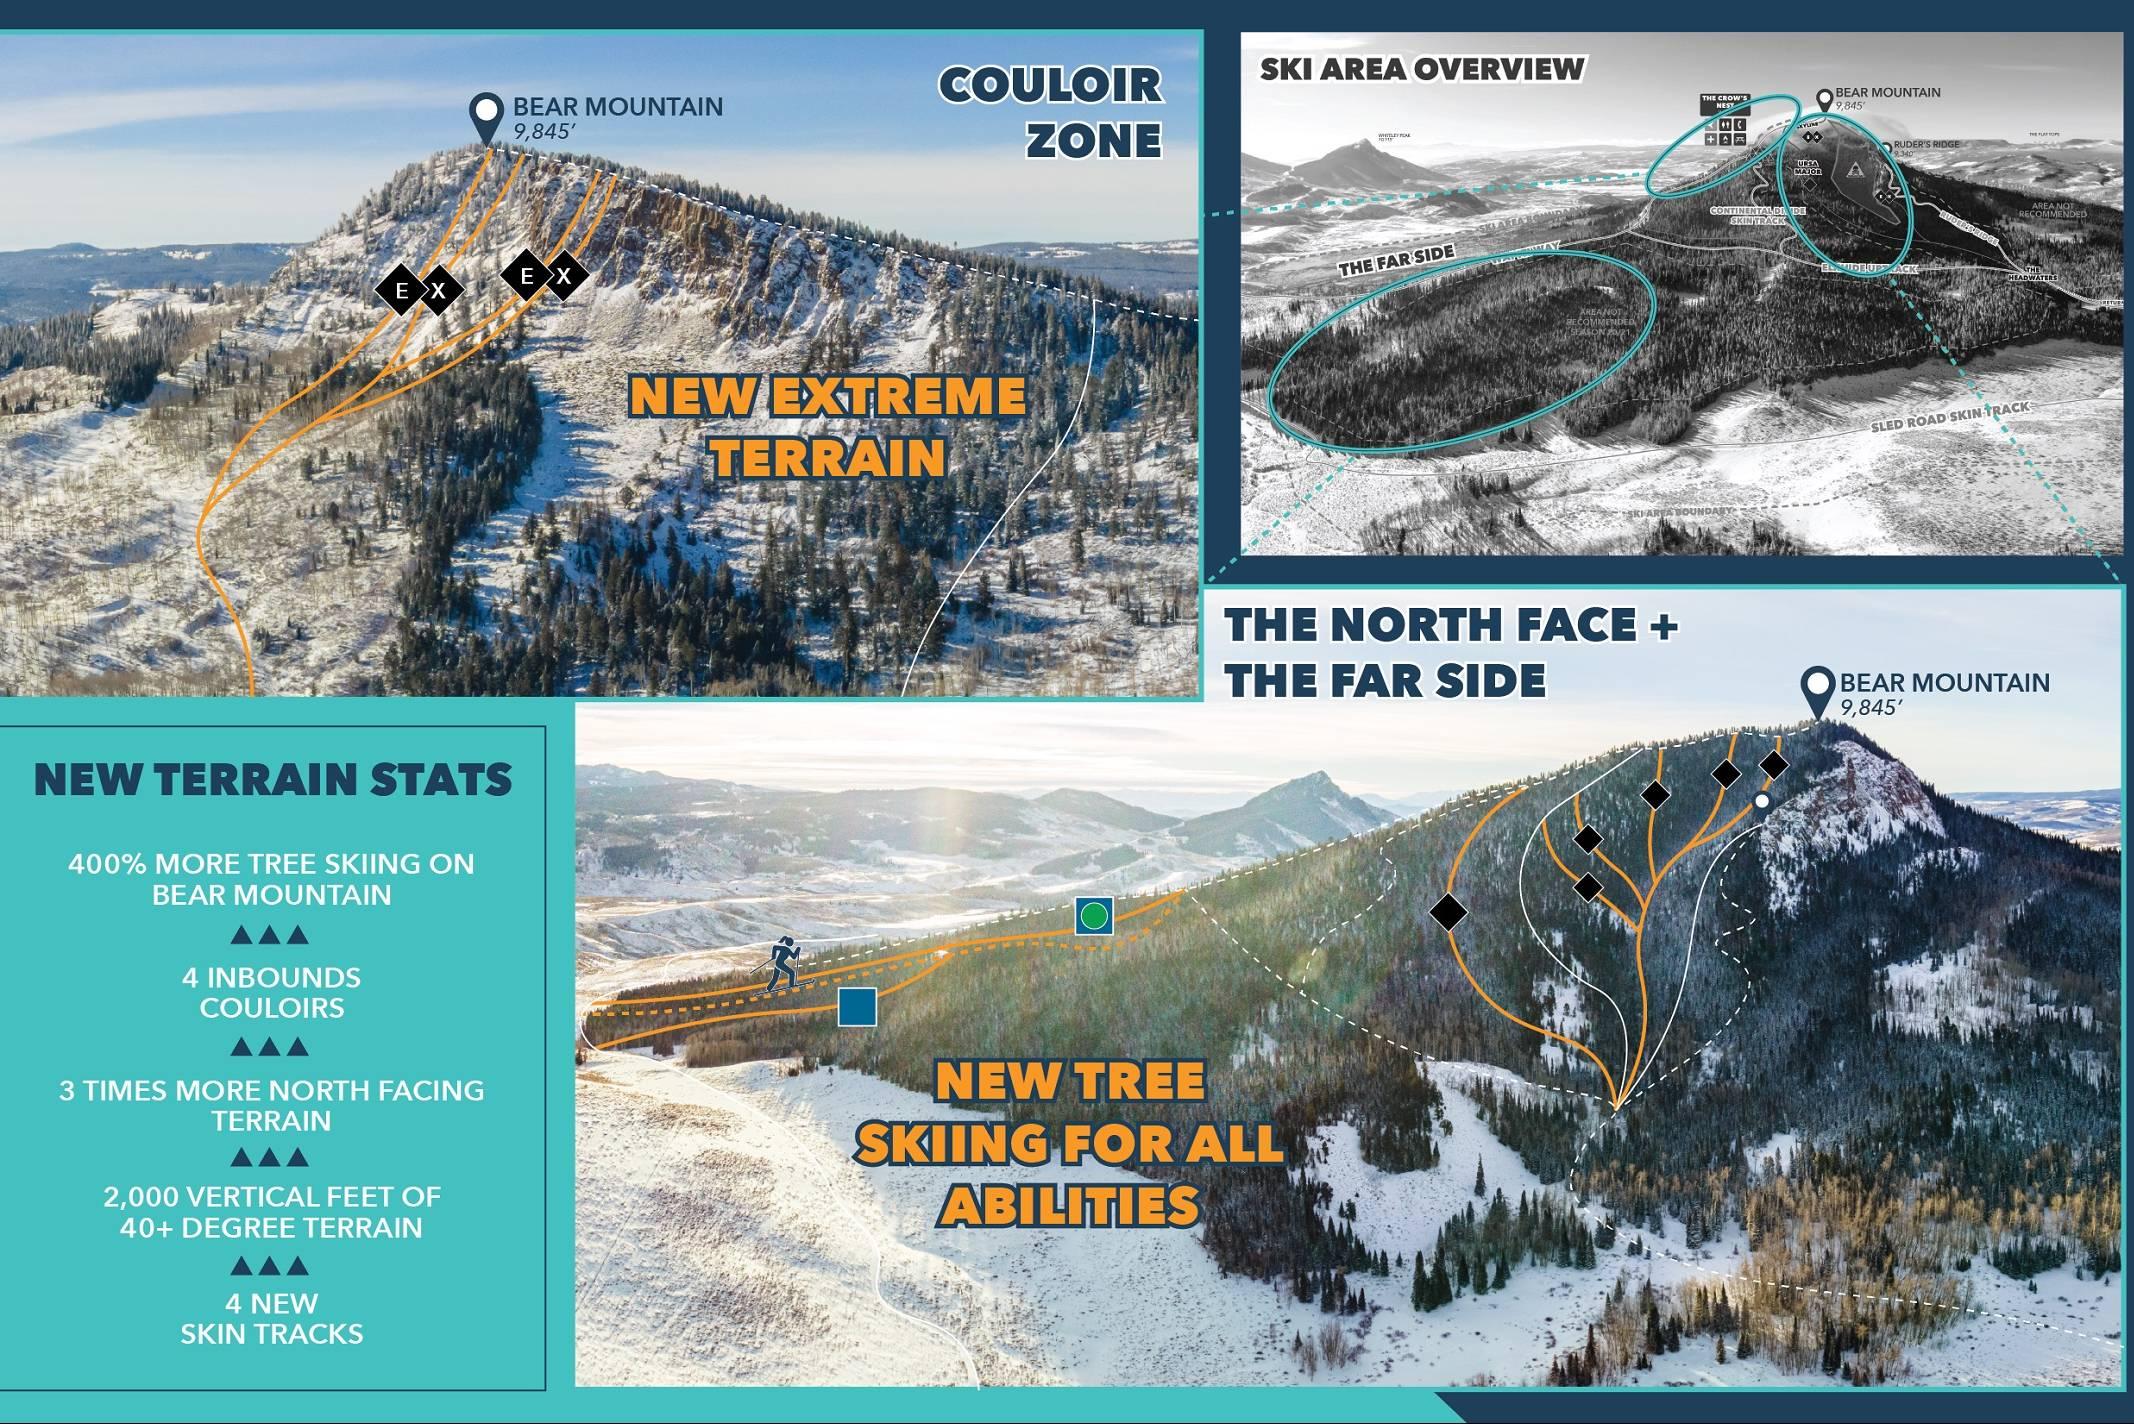 2022 New Terrain Bluebird Backcountry